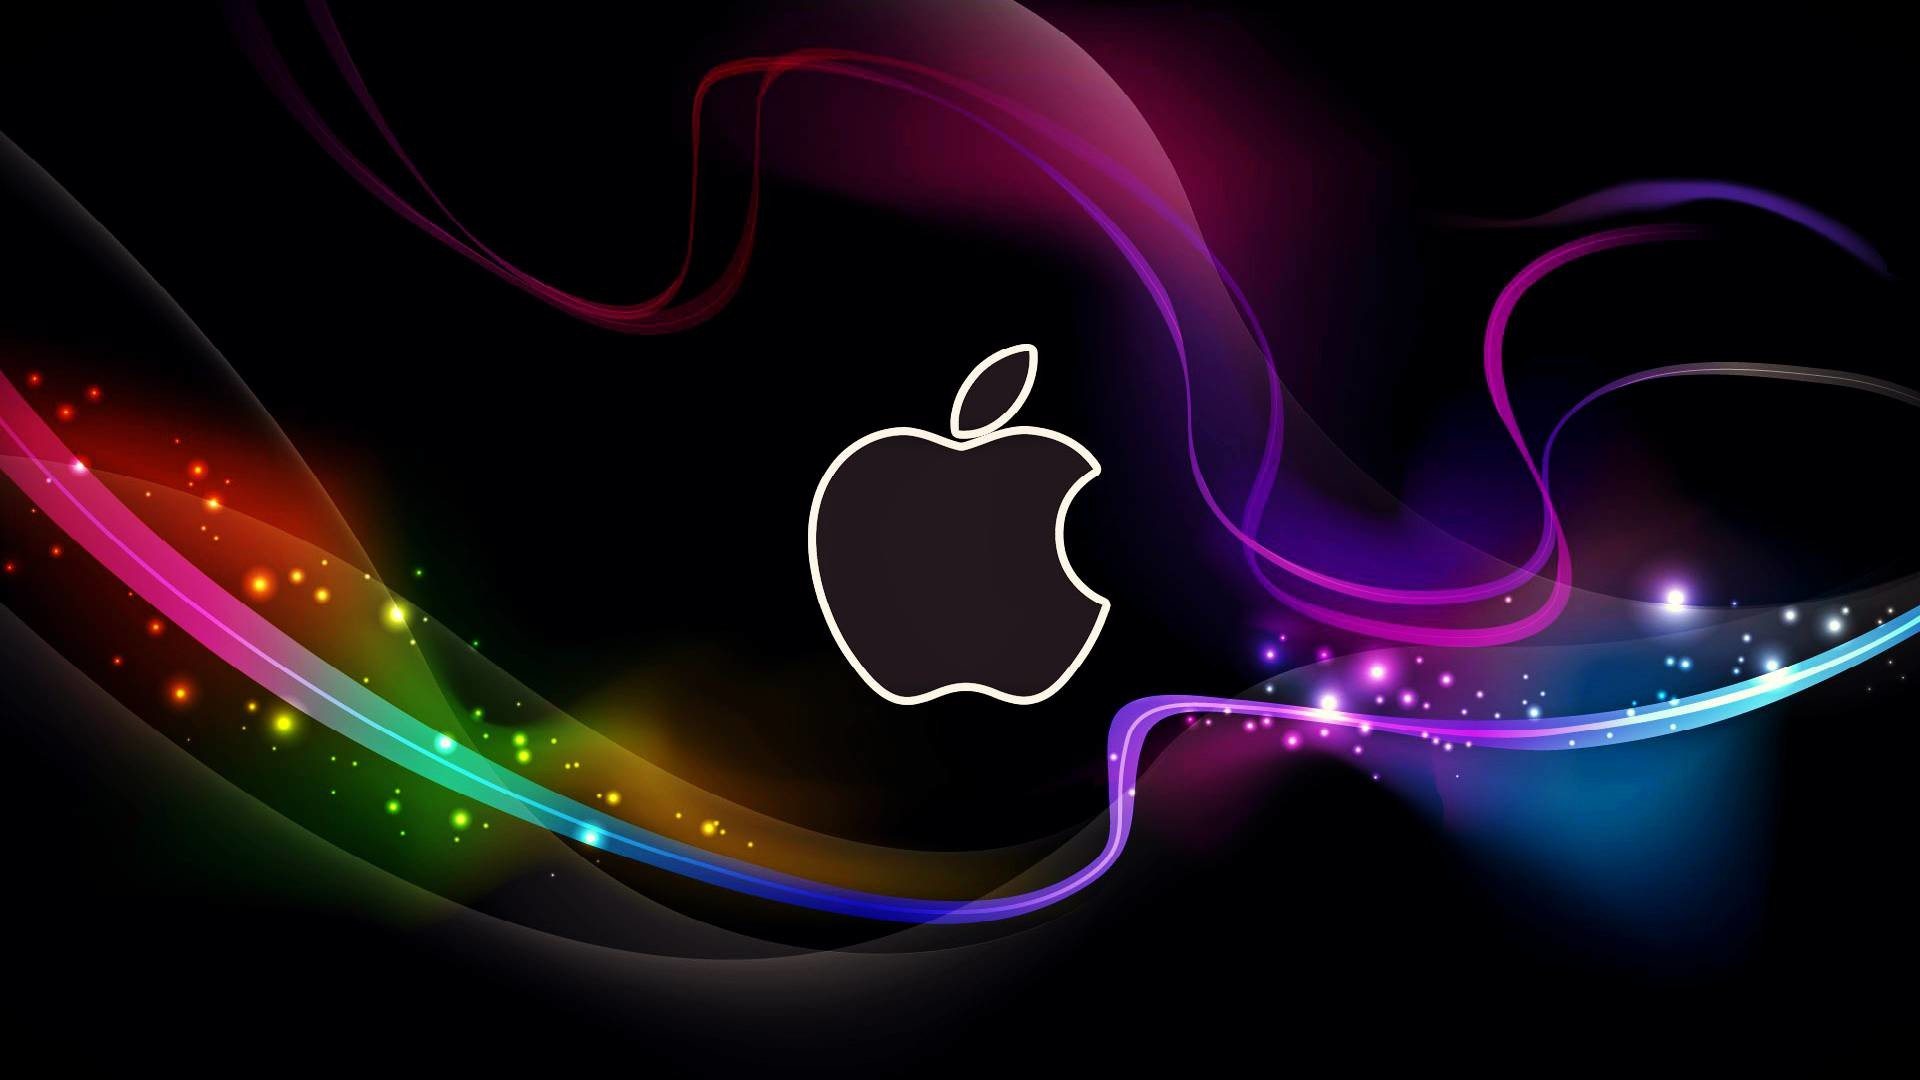 Gallery for – cool apple logo wallpaper